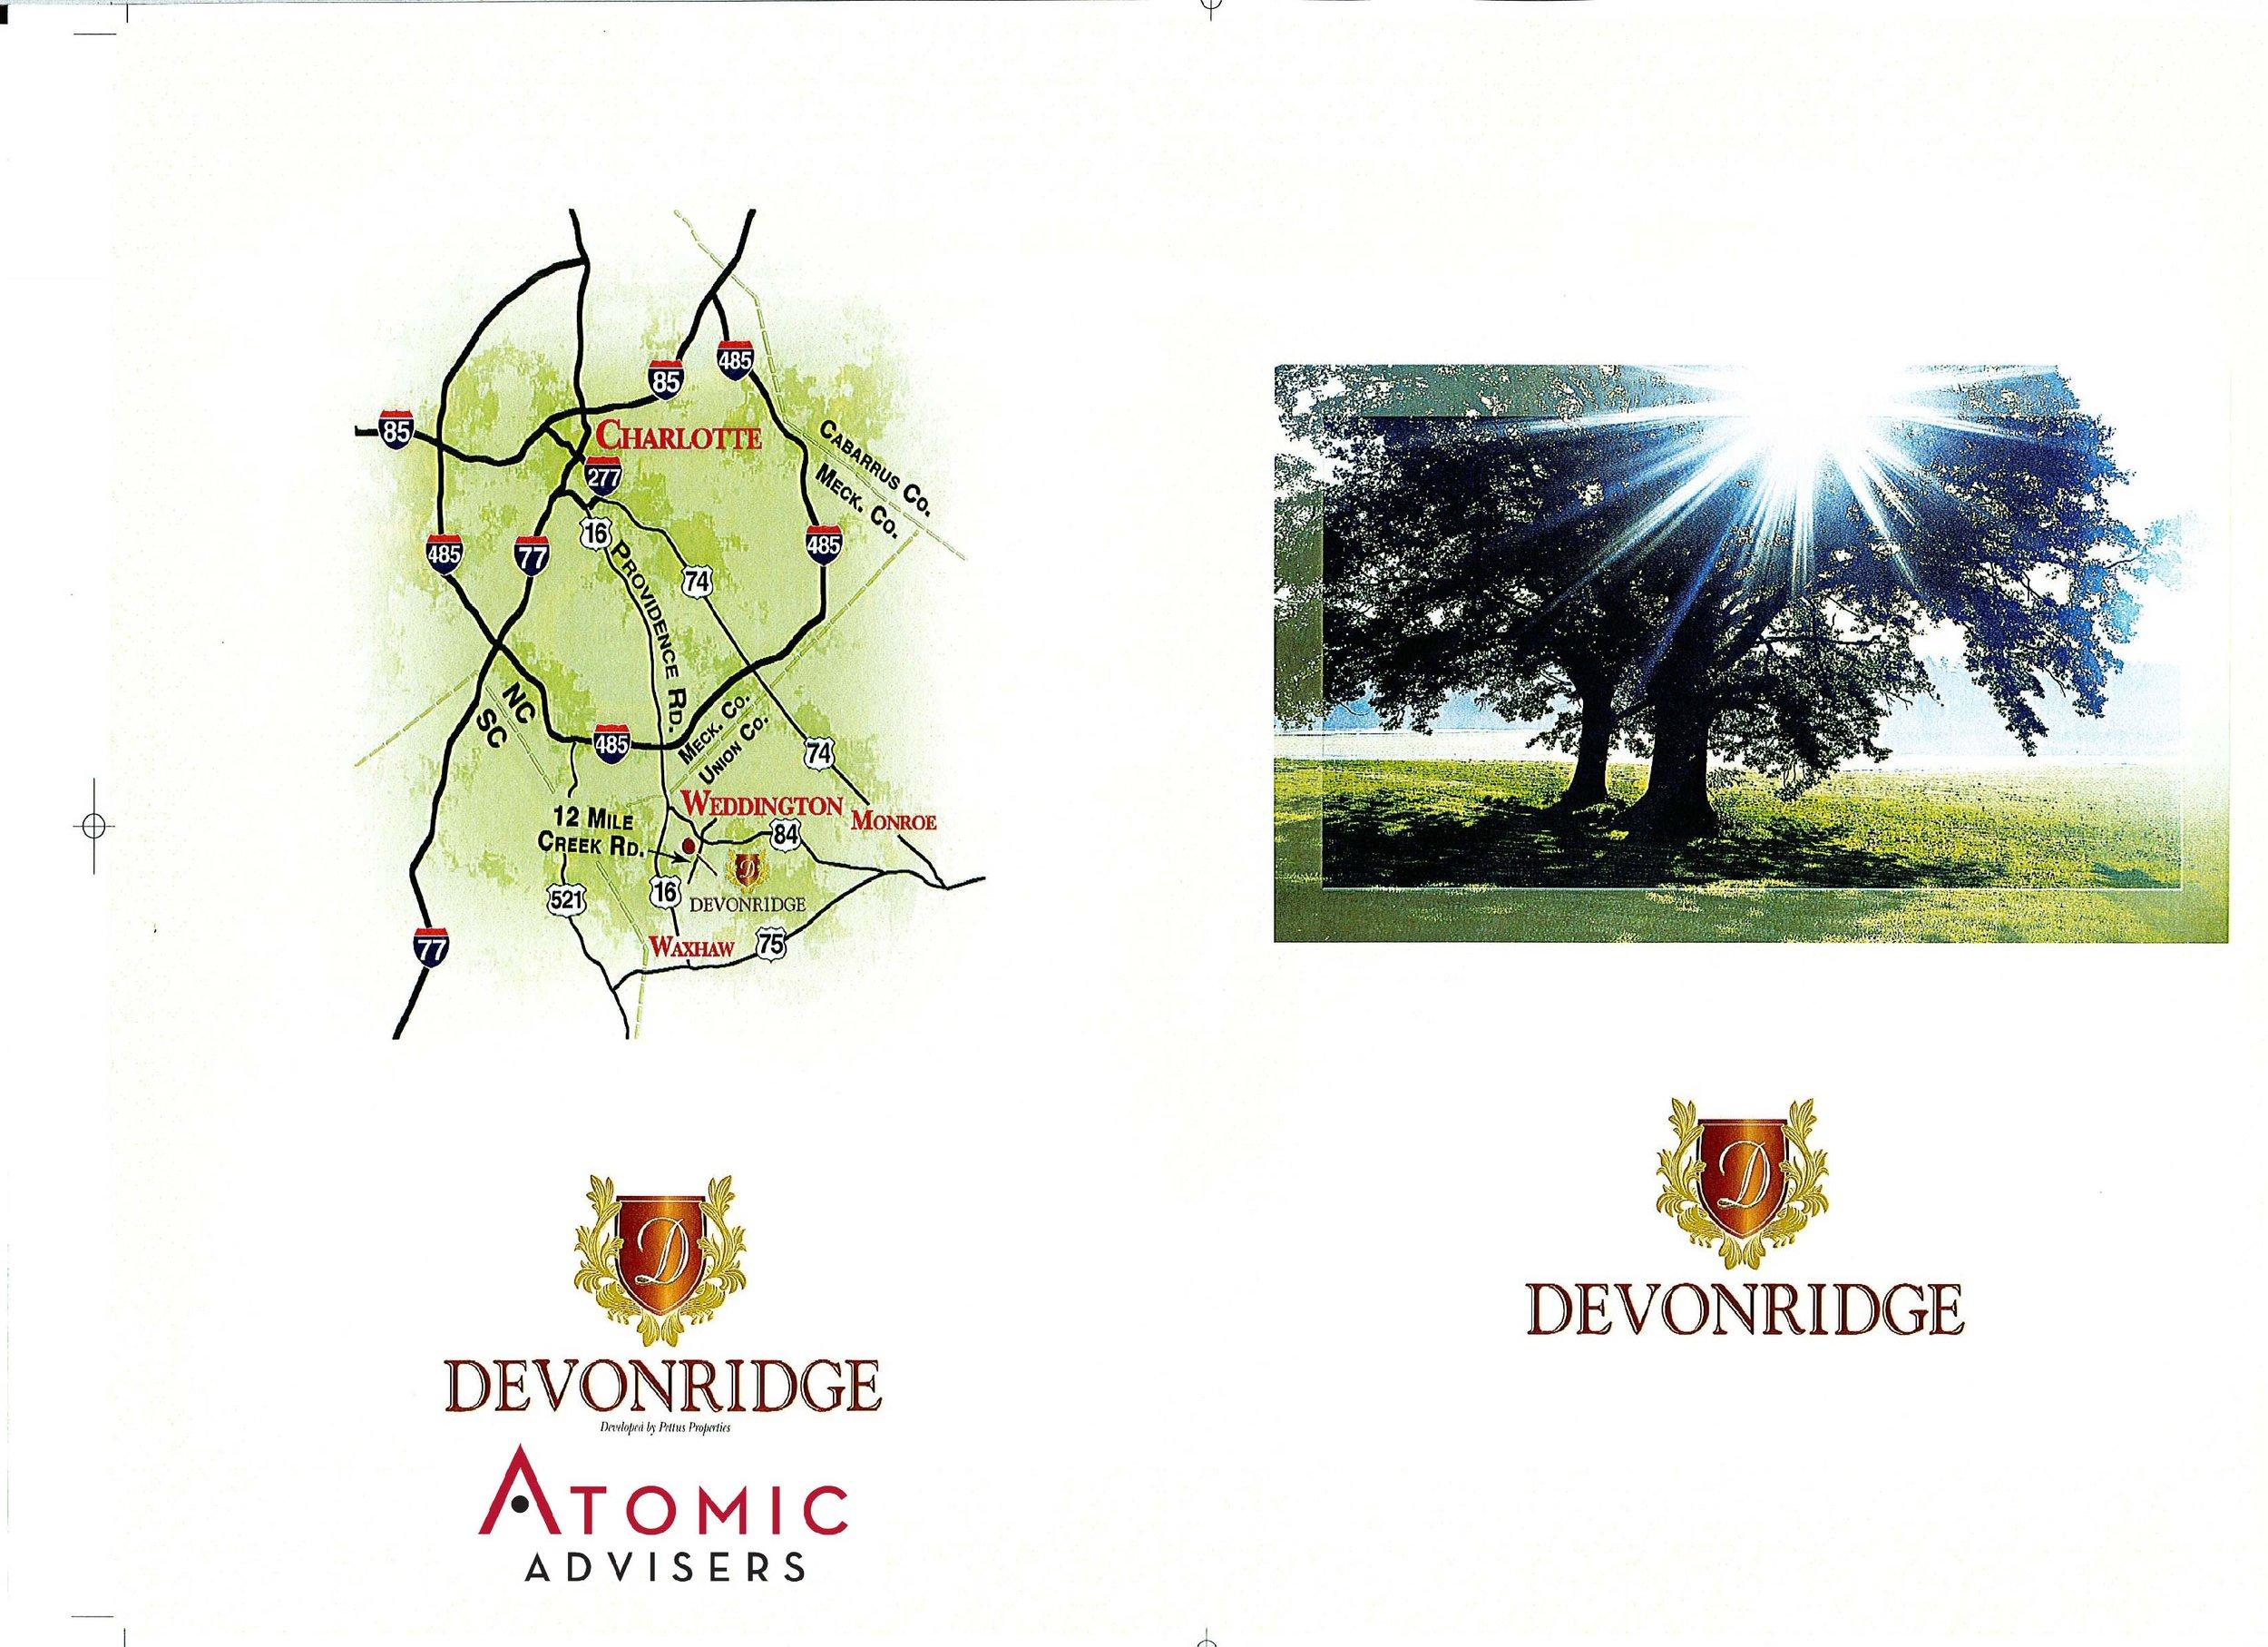 Atomic - DEVONRIDGErevisedsitemap 120711 2a.jpg